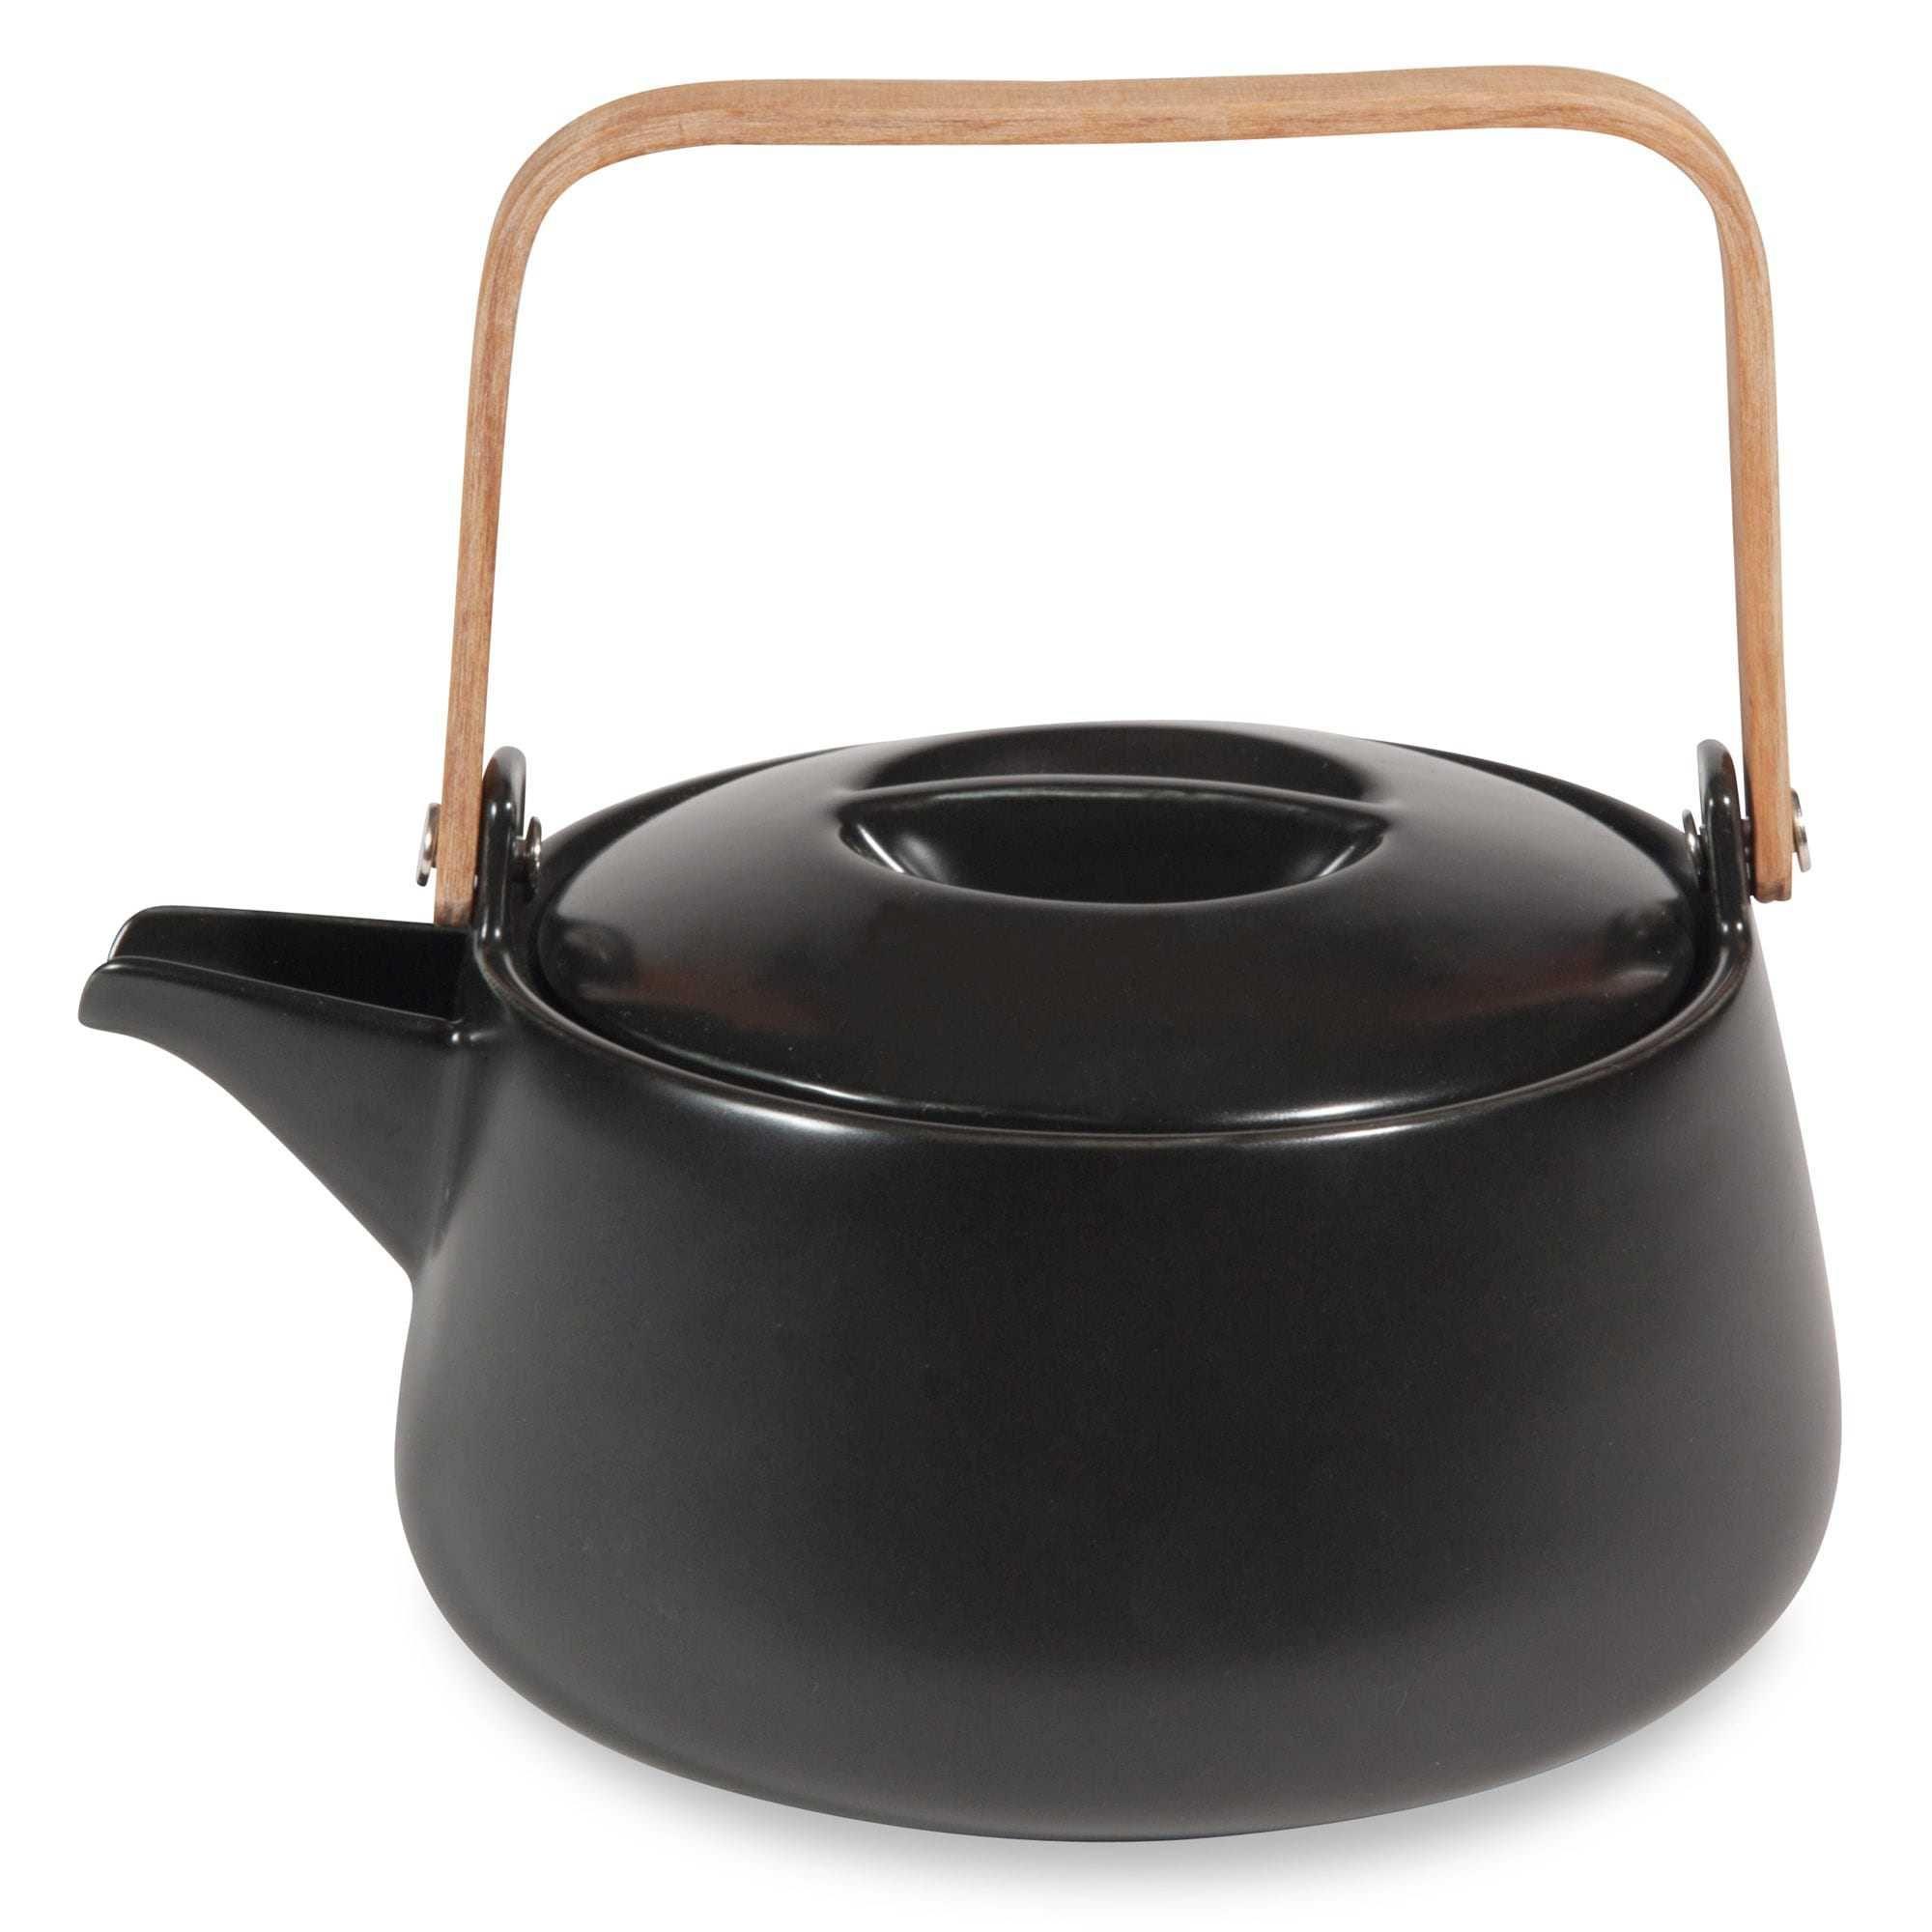 Teiera in porcellana nera 1L LAGOS